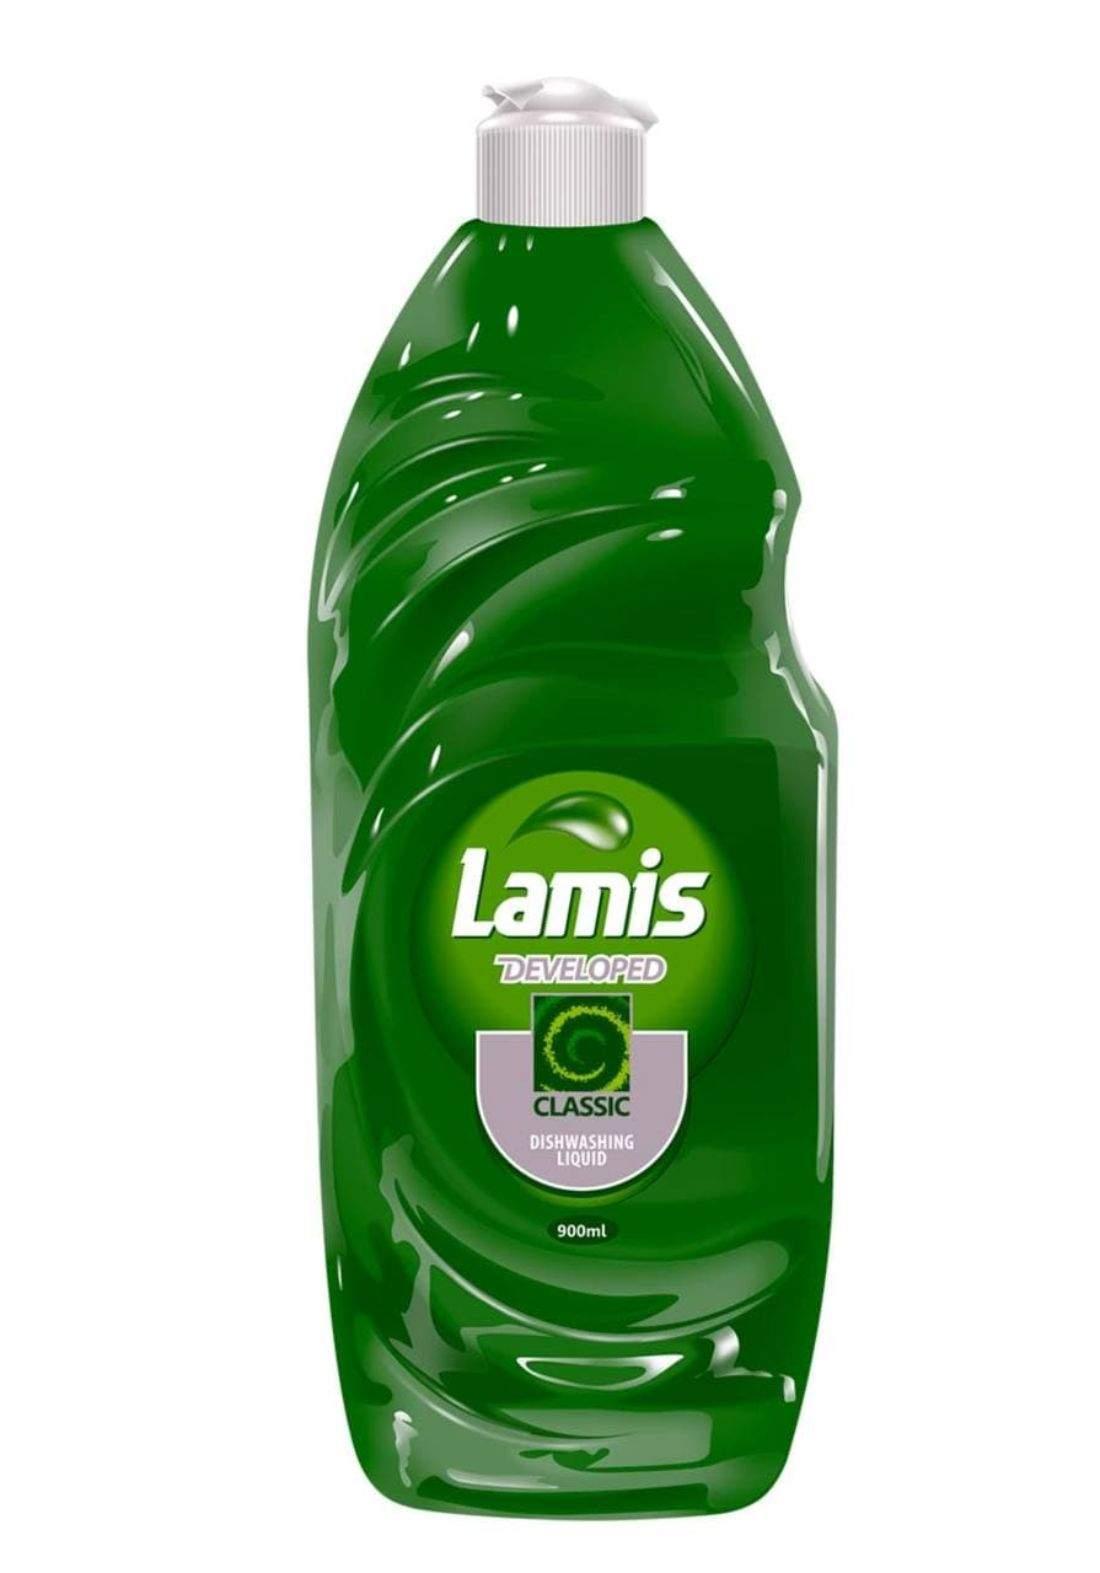 lamis  dishwashing liquid 900ml لميس  سائل غسيل الصحون